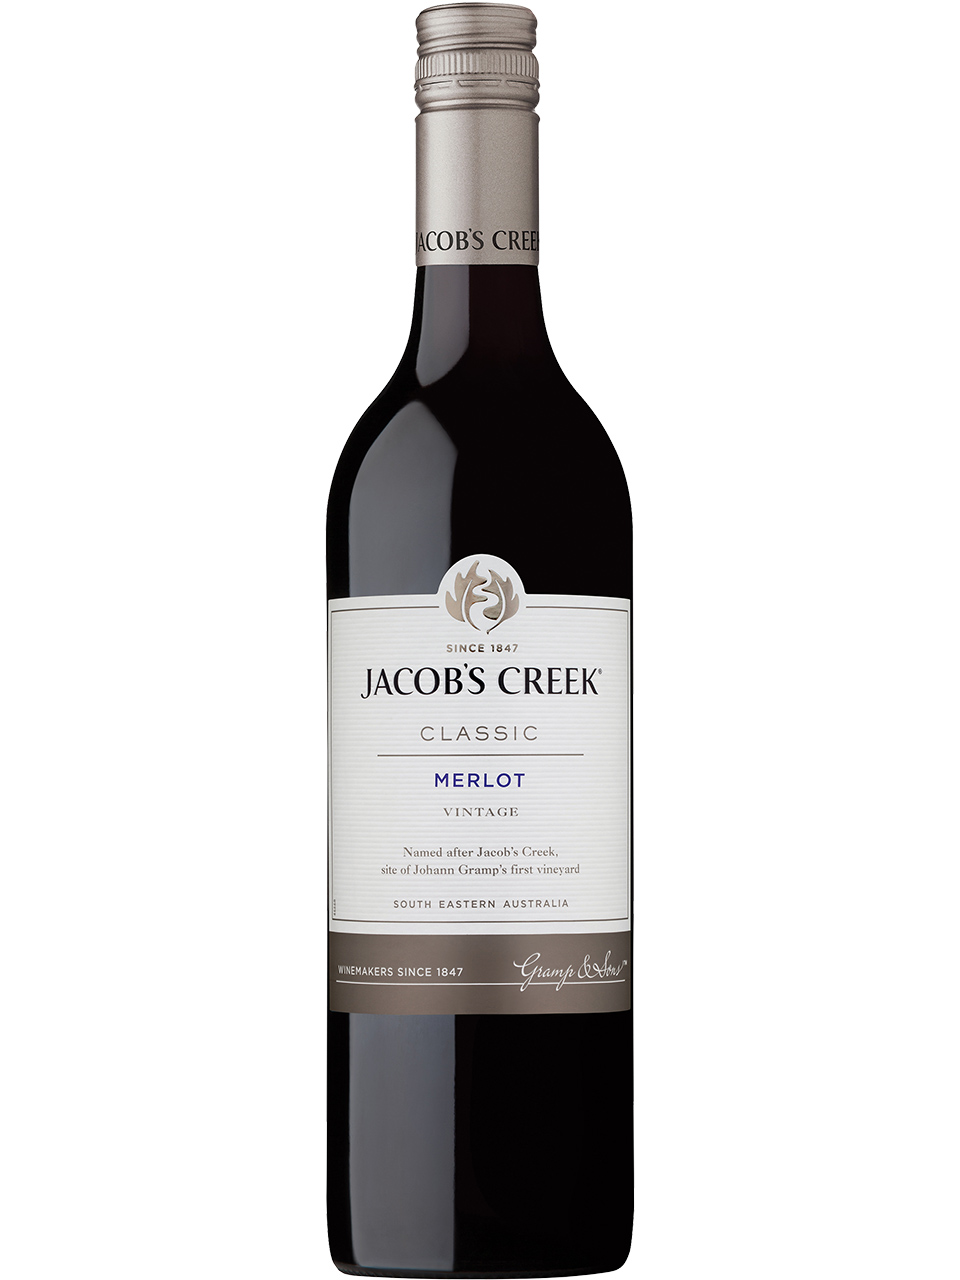 Jacob's Creek Merlot